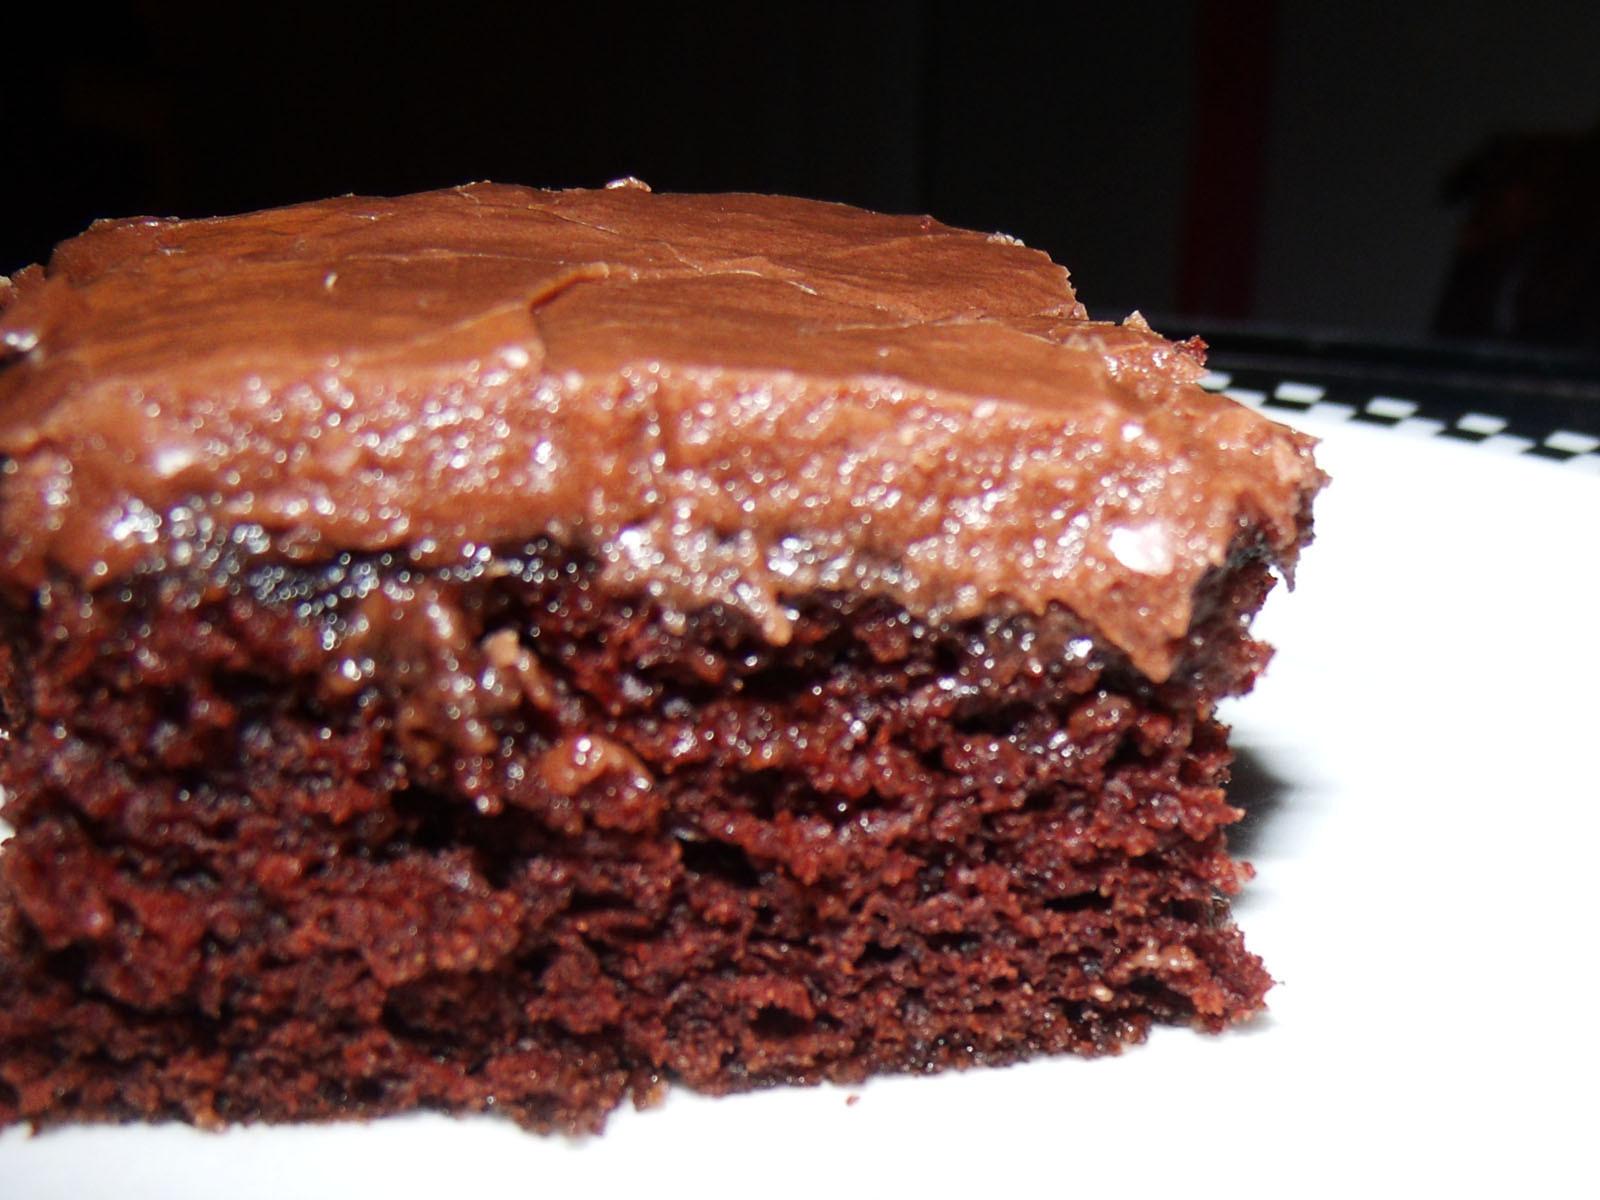 Chocolate Brownies Cake  Brownie Cake with Chocolate Frosting